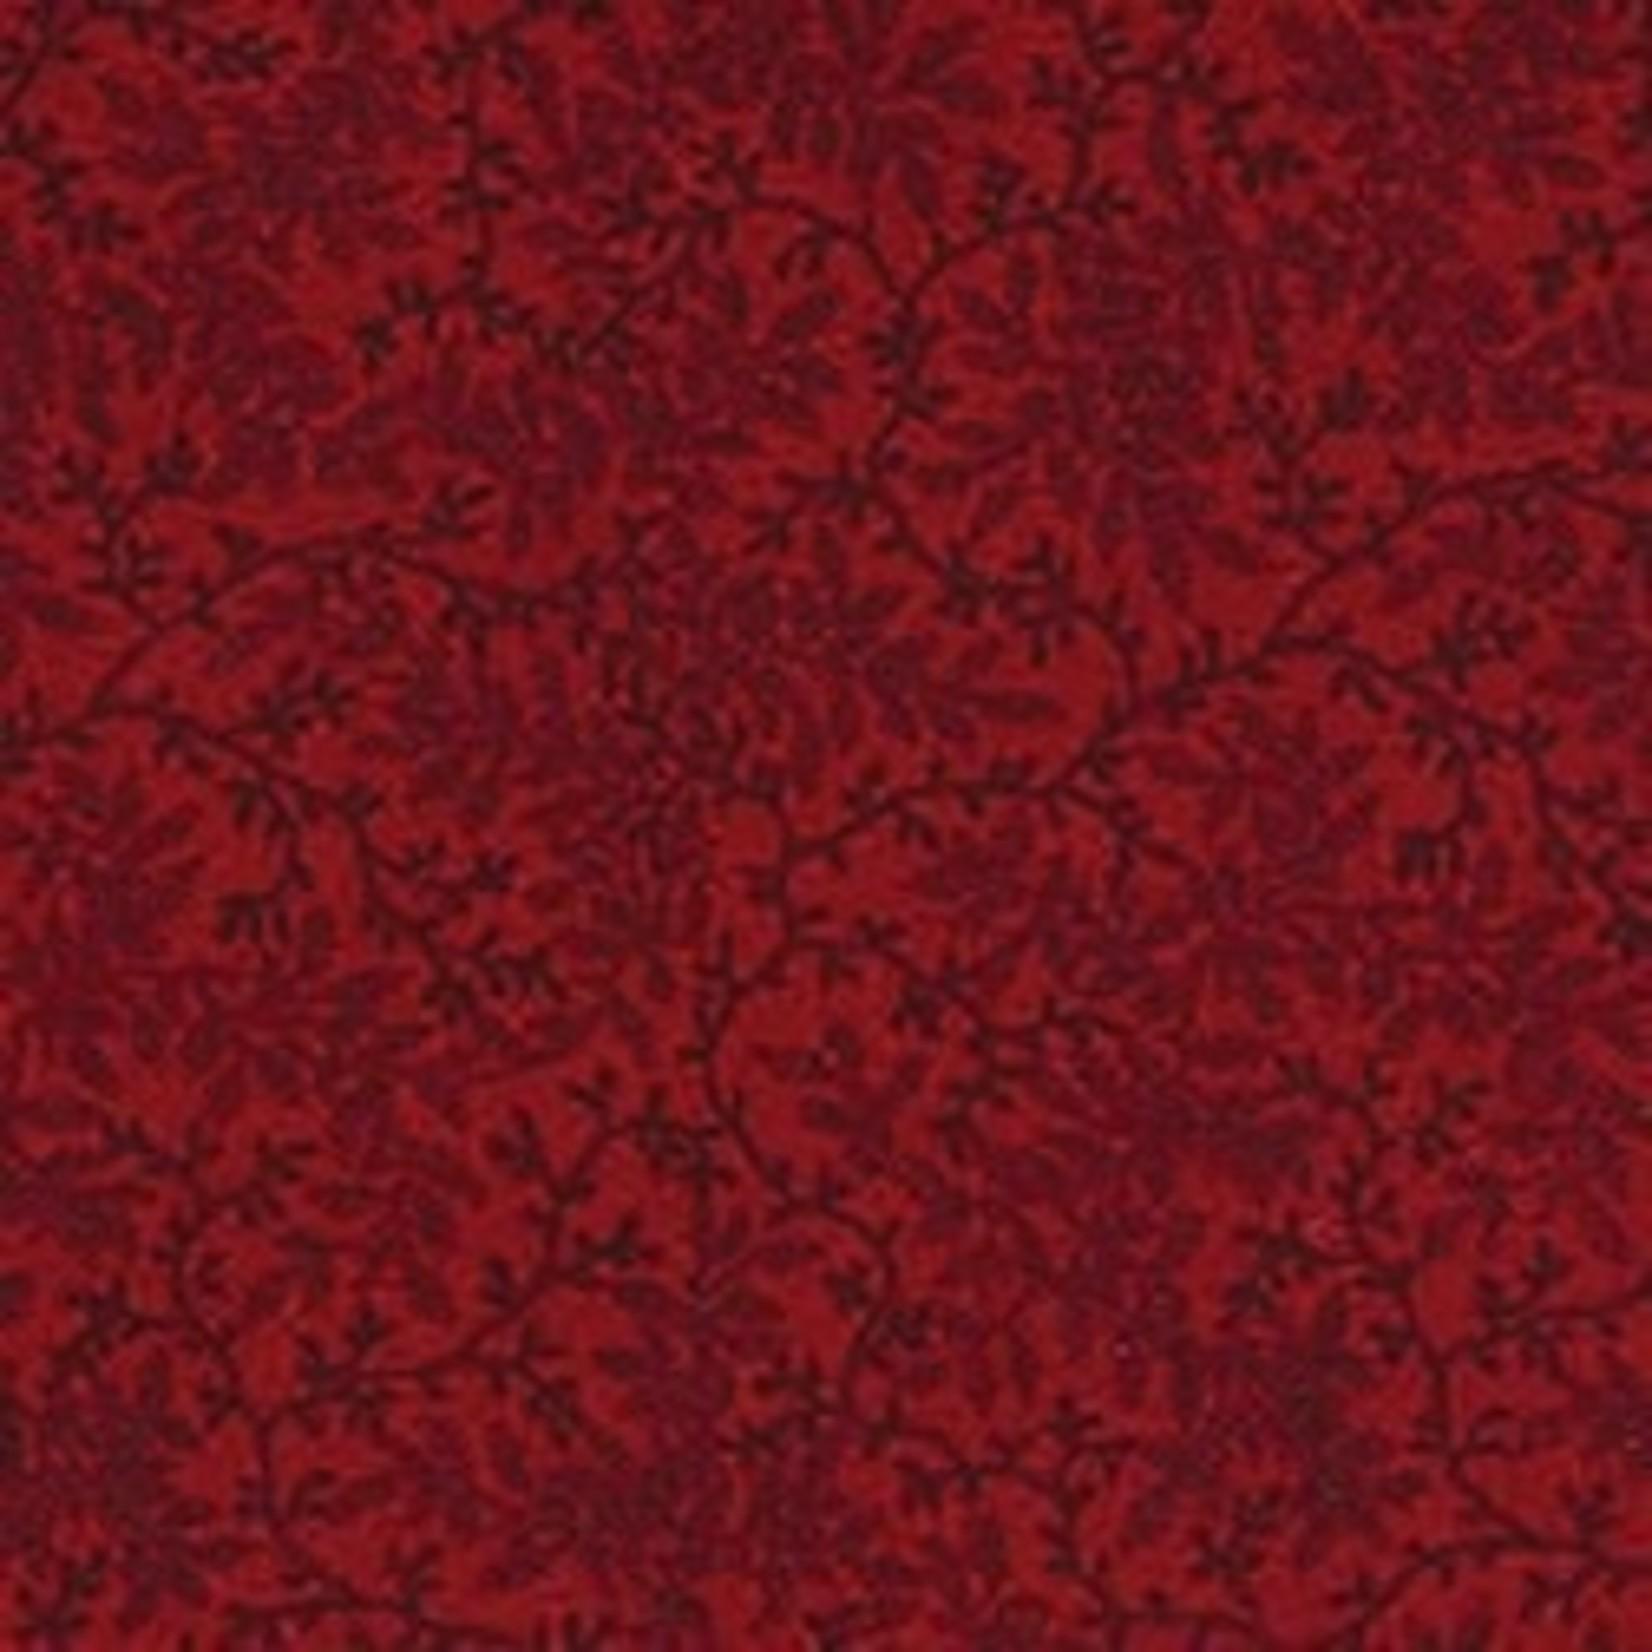 Benartex Studio Delicate Vines - Antique Red